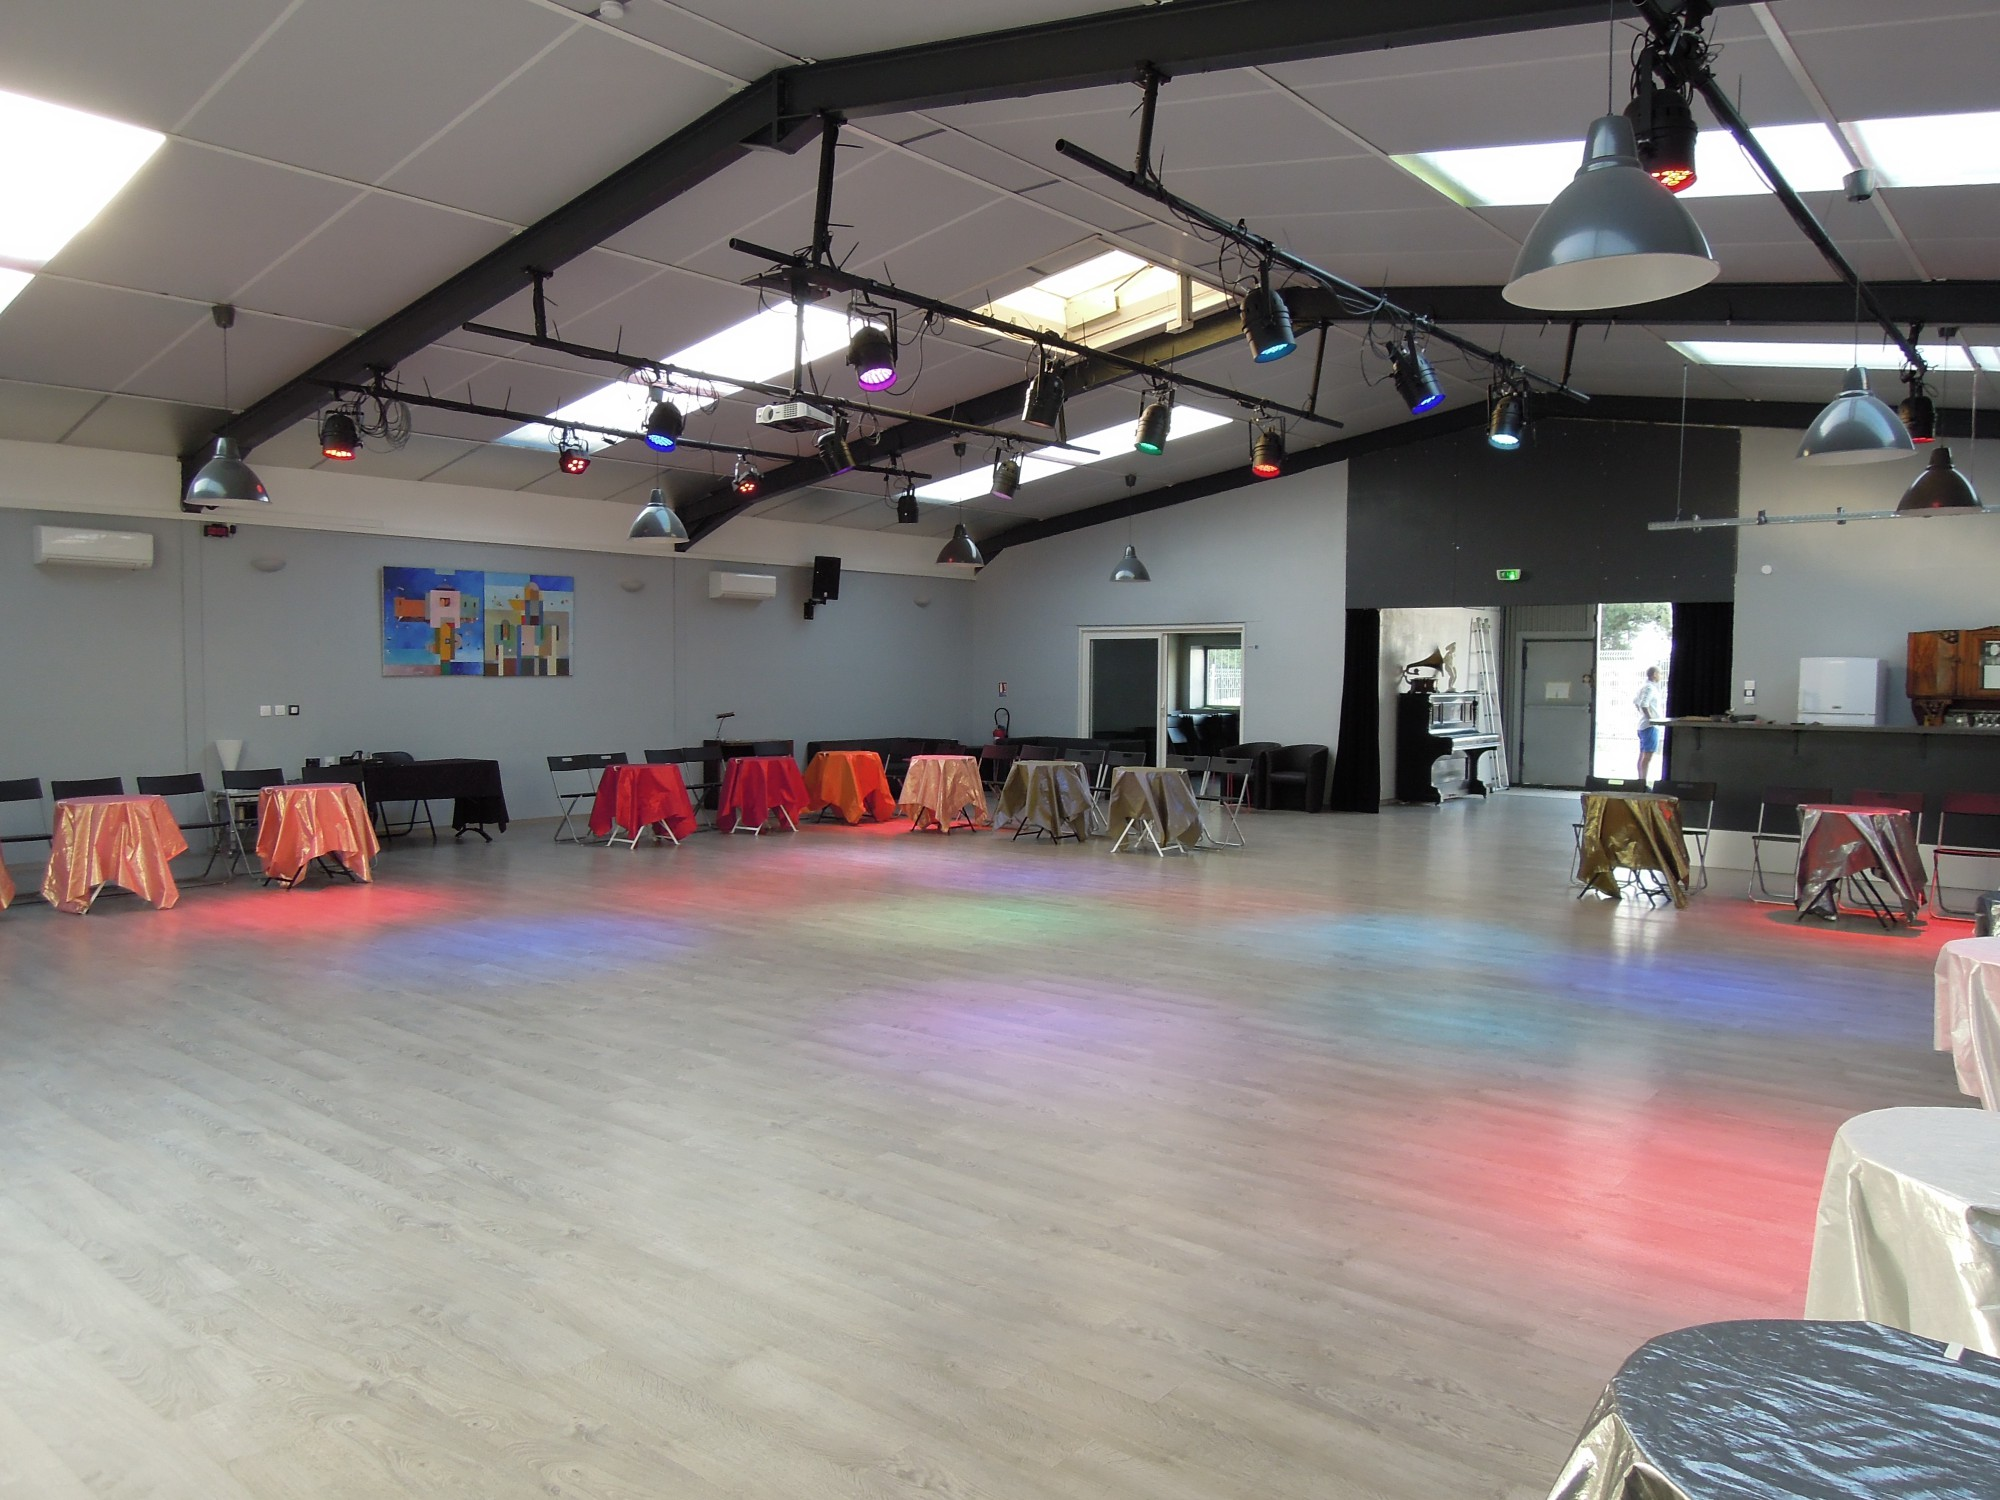 Dscn4394 el sal n de tango rufino luro cambaceres location salle de danse montpellier - Danse de salon montpellier ...